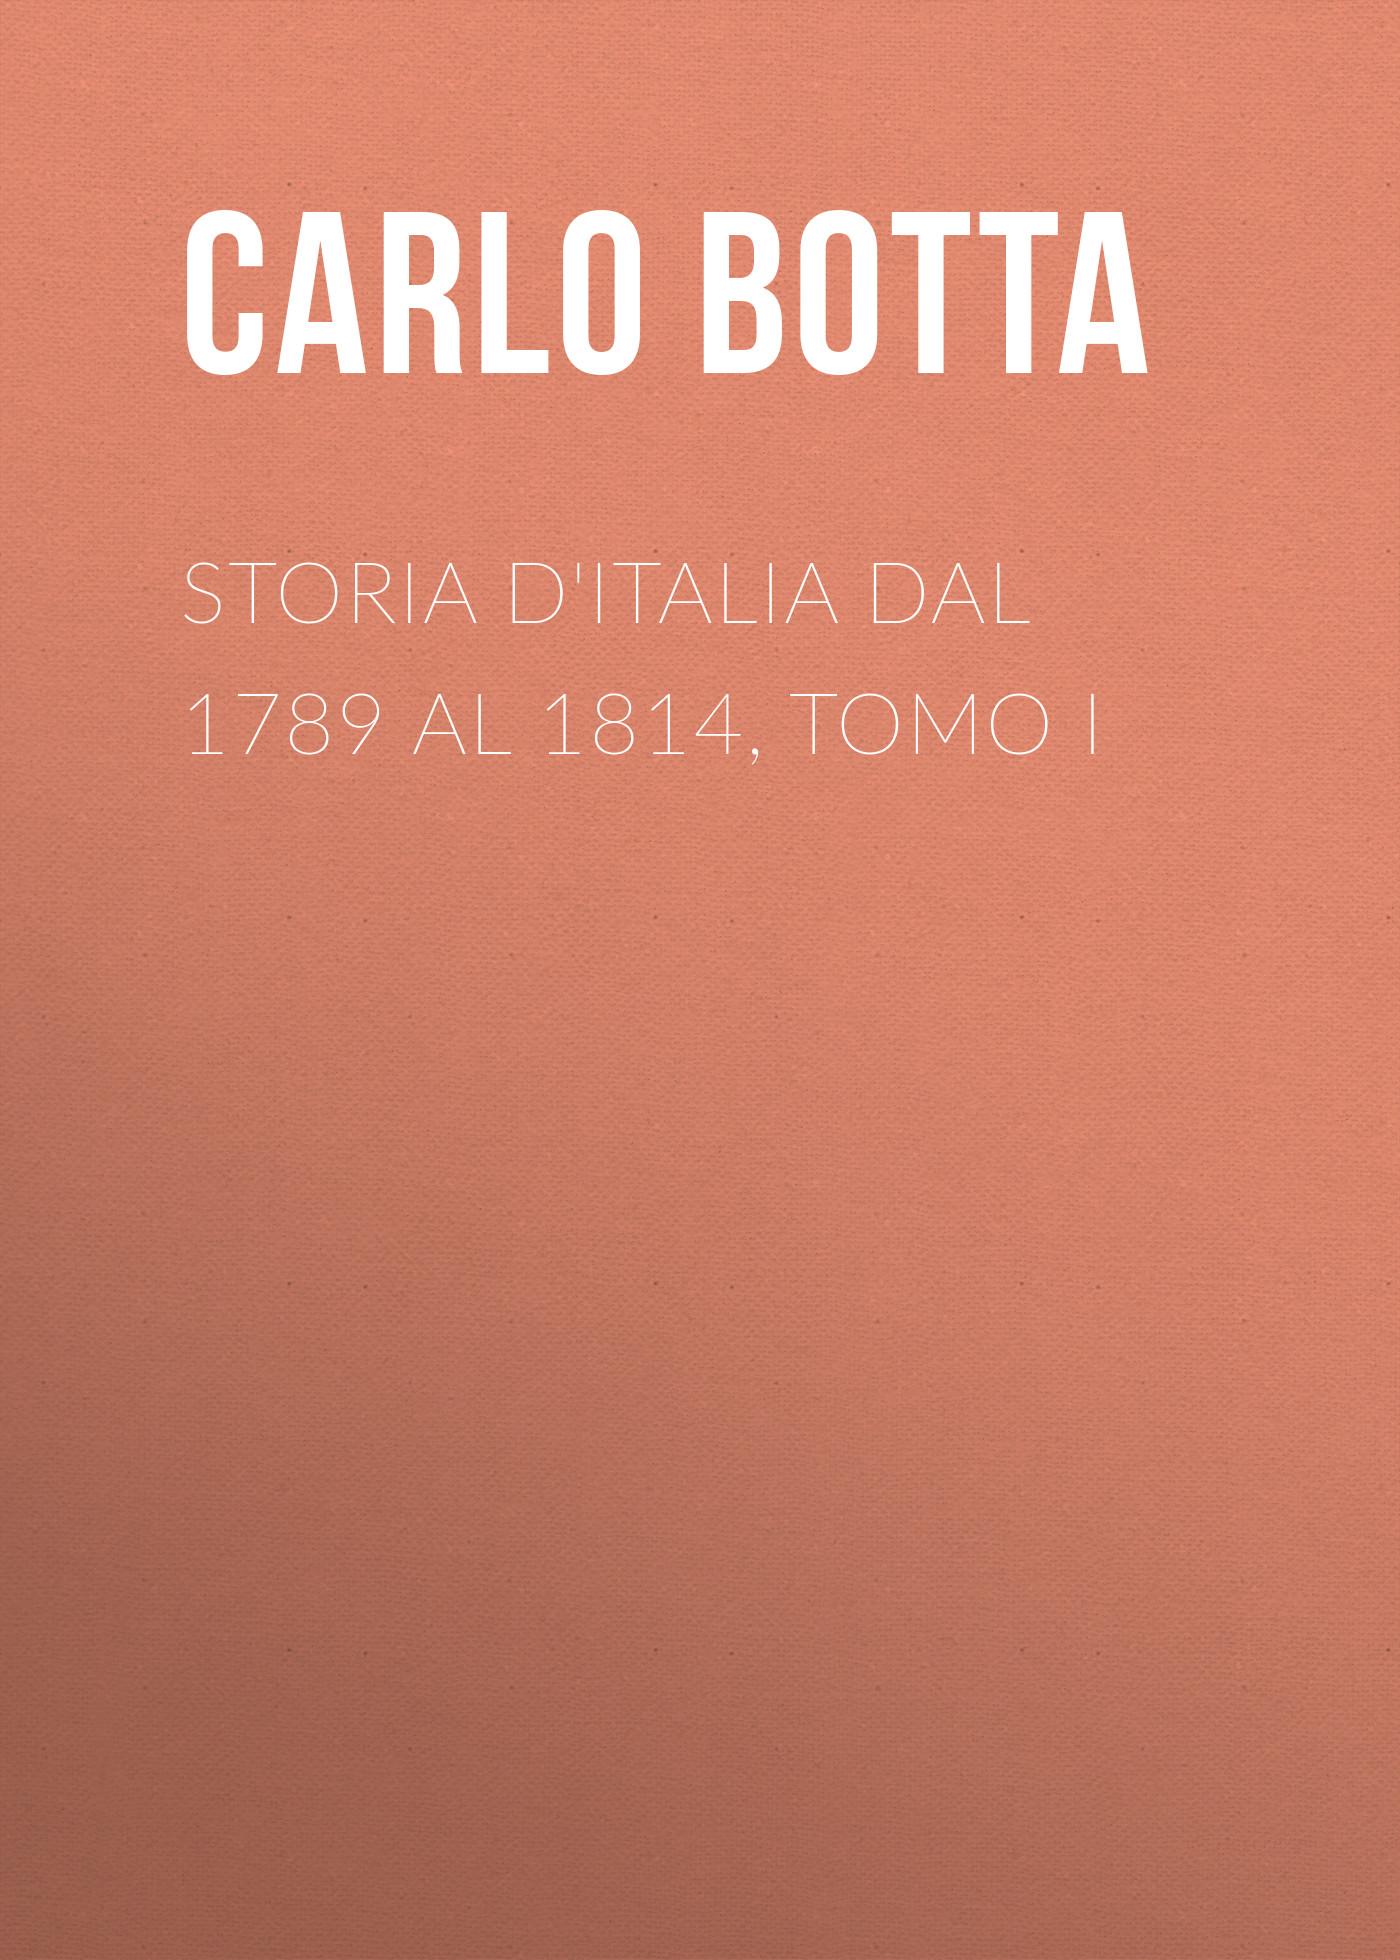 Botta Carlo Storia d'Italia dal 1789 al 1814, tomo I charles botta histoire d italie de 1789 a 1814 t 1